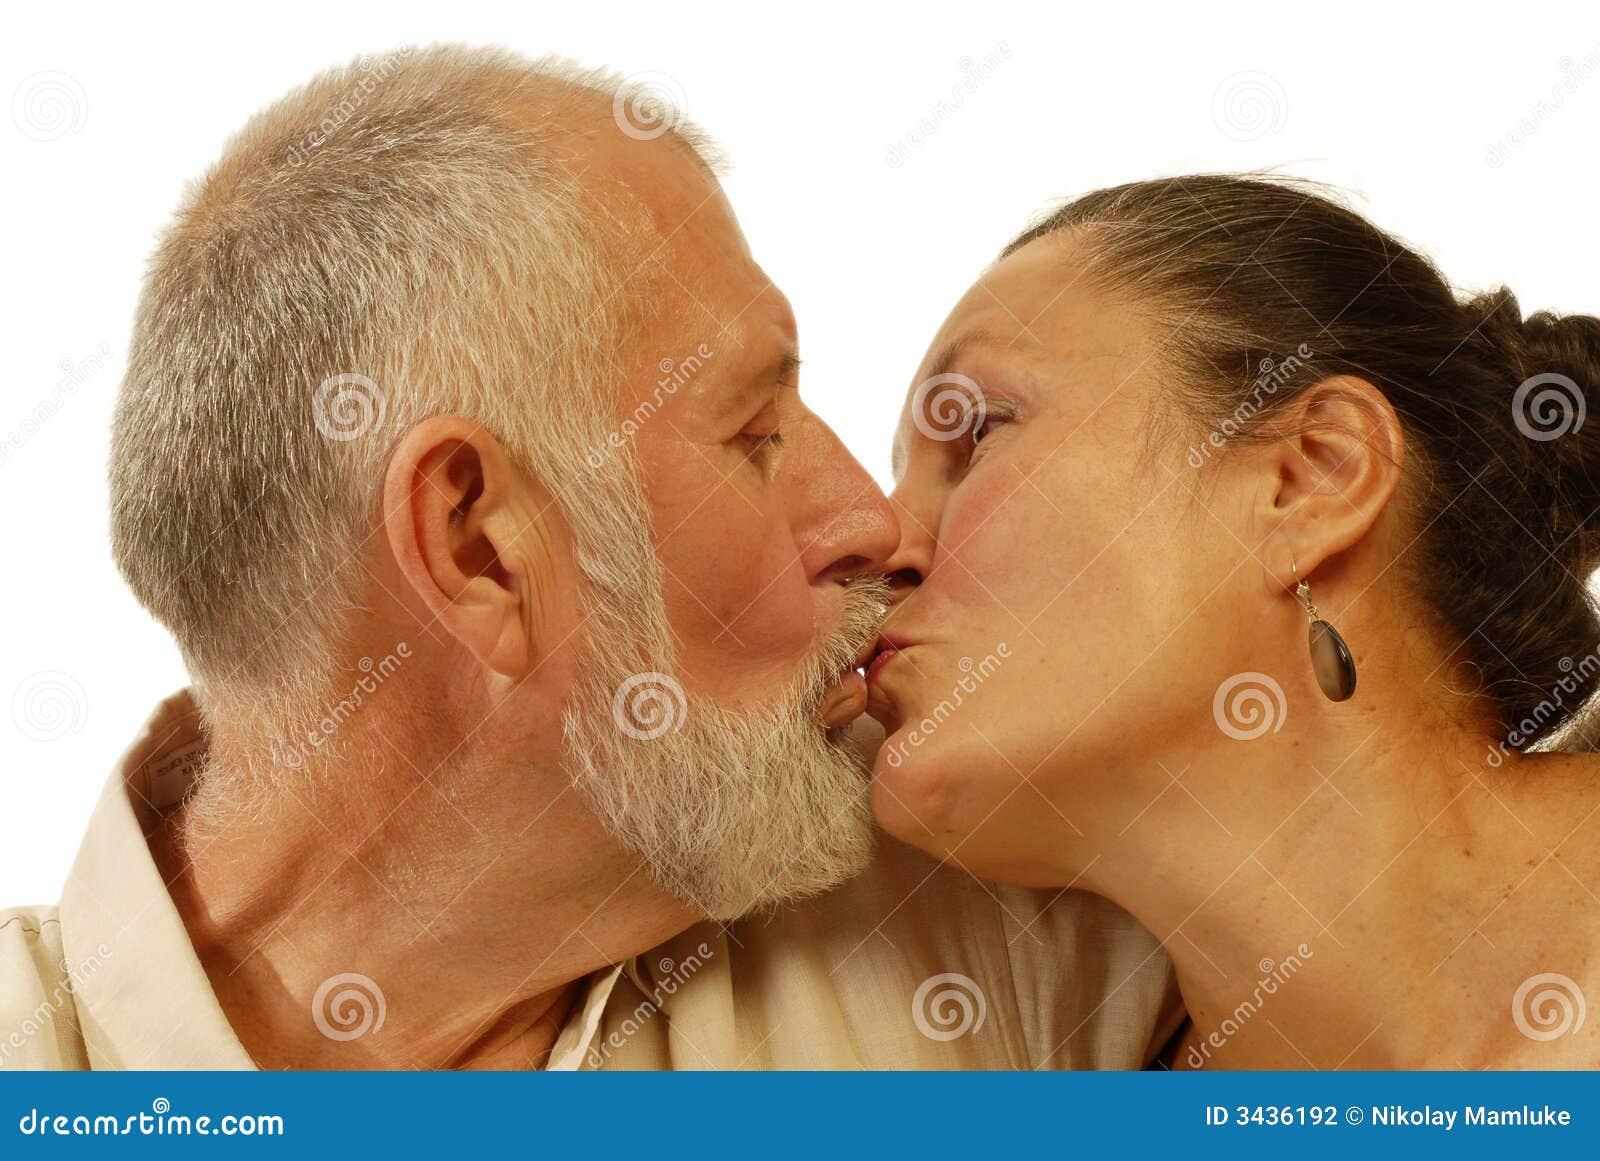 senior kissing stock photo. image of hope, friendship - 3436192